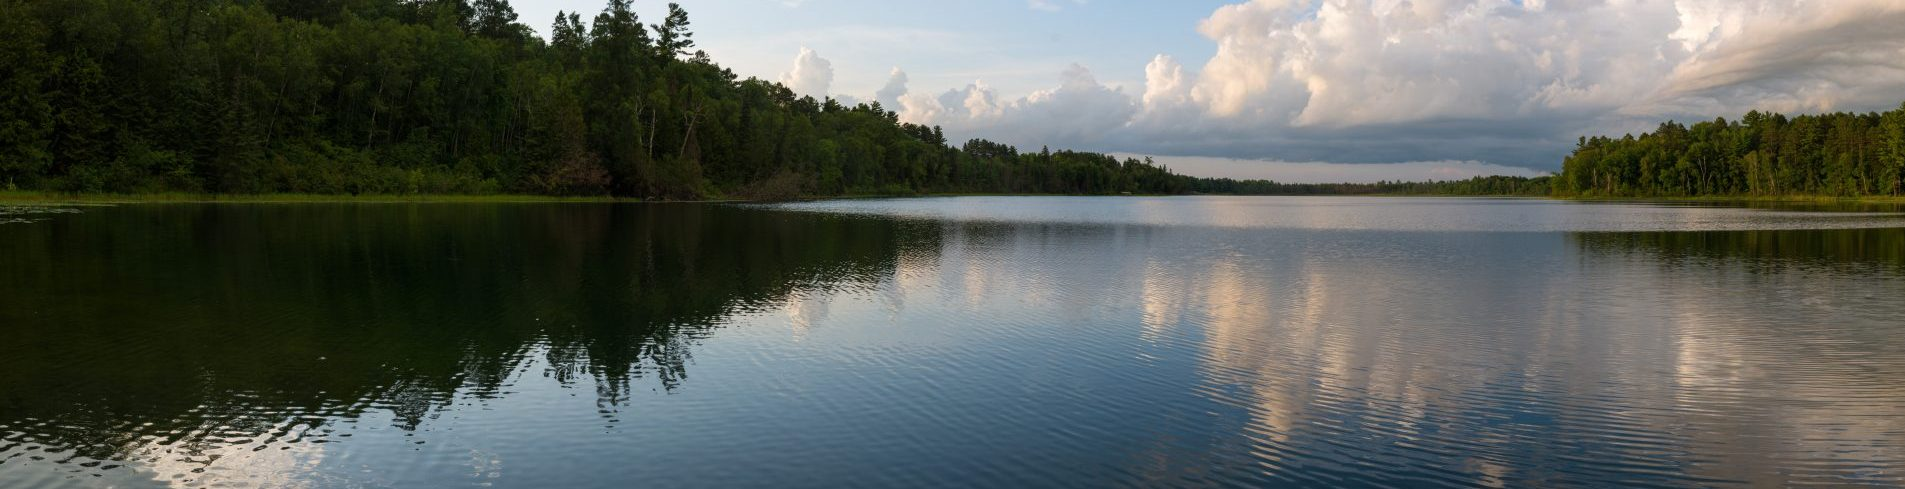 Camp Olson